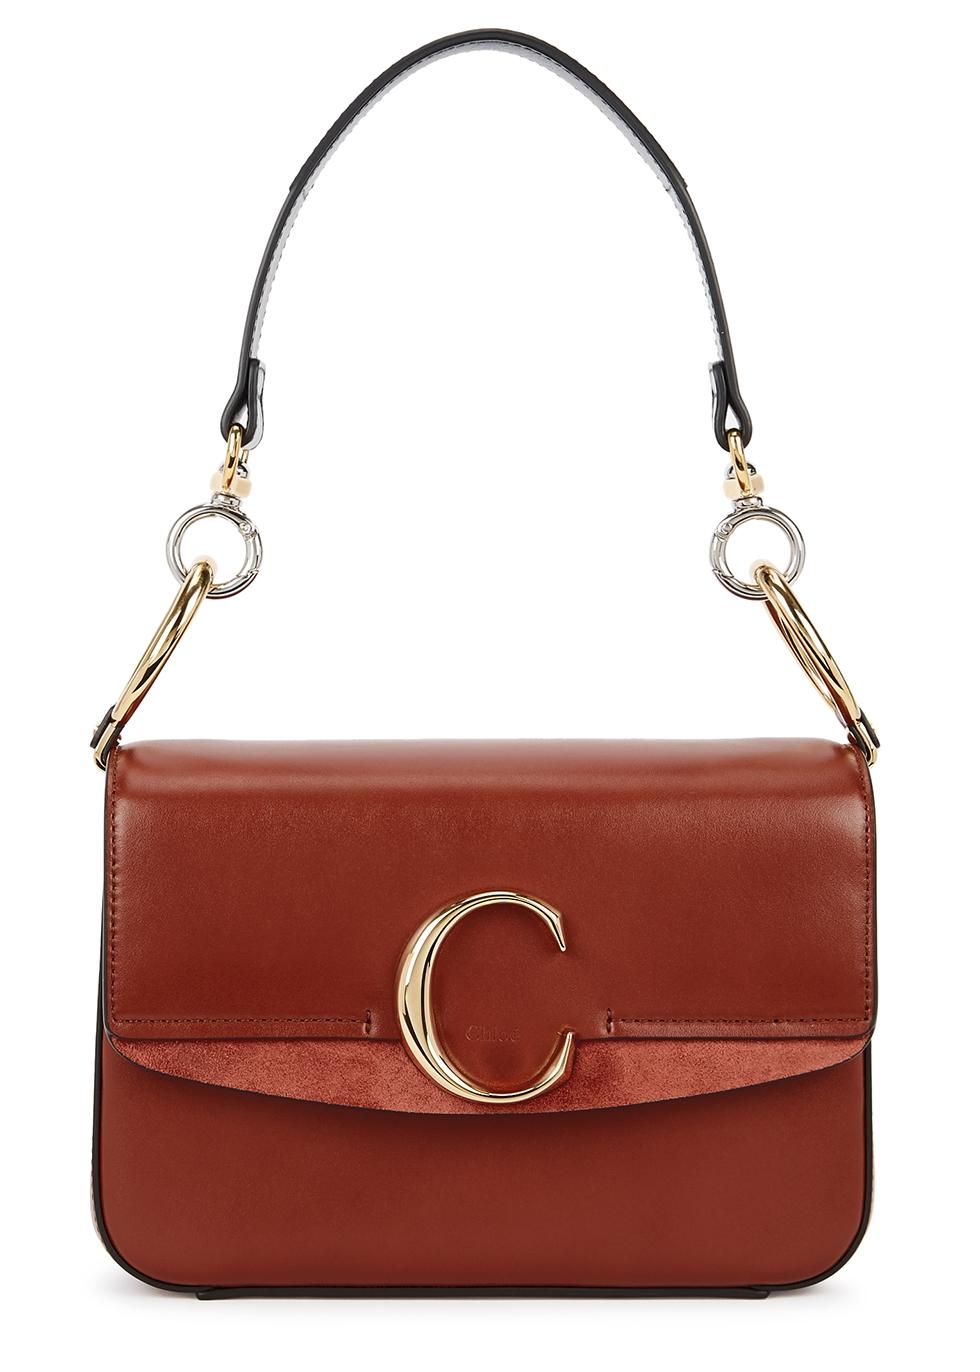 d842524cea75 Women's Designer Bags, Handbags and Purses - Harvey Nichols